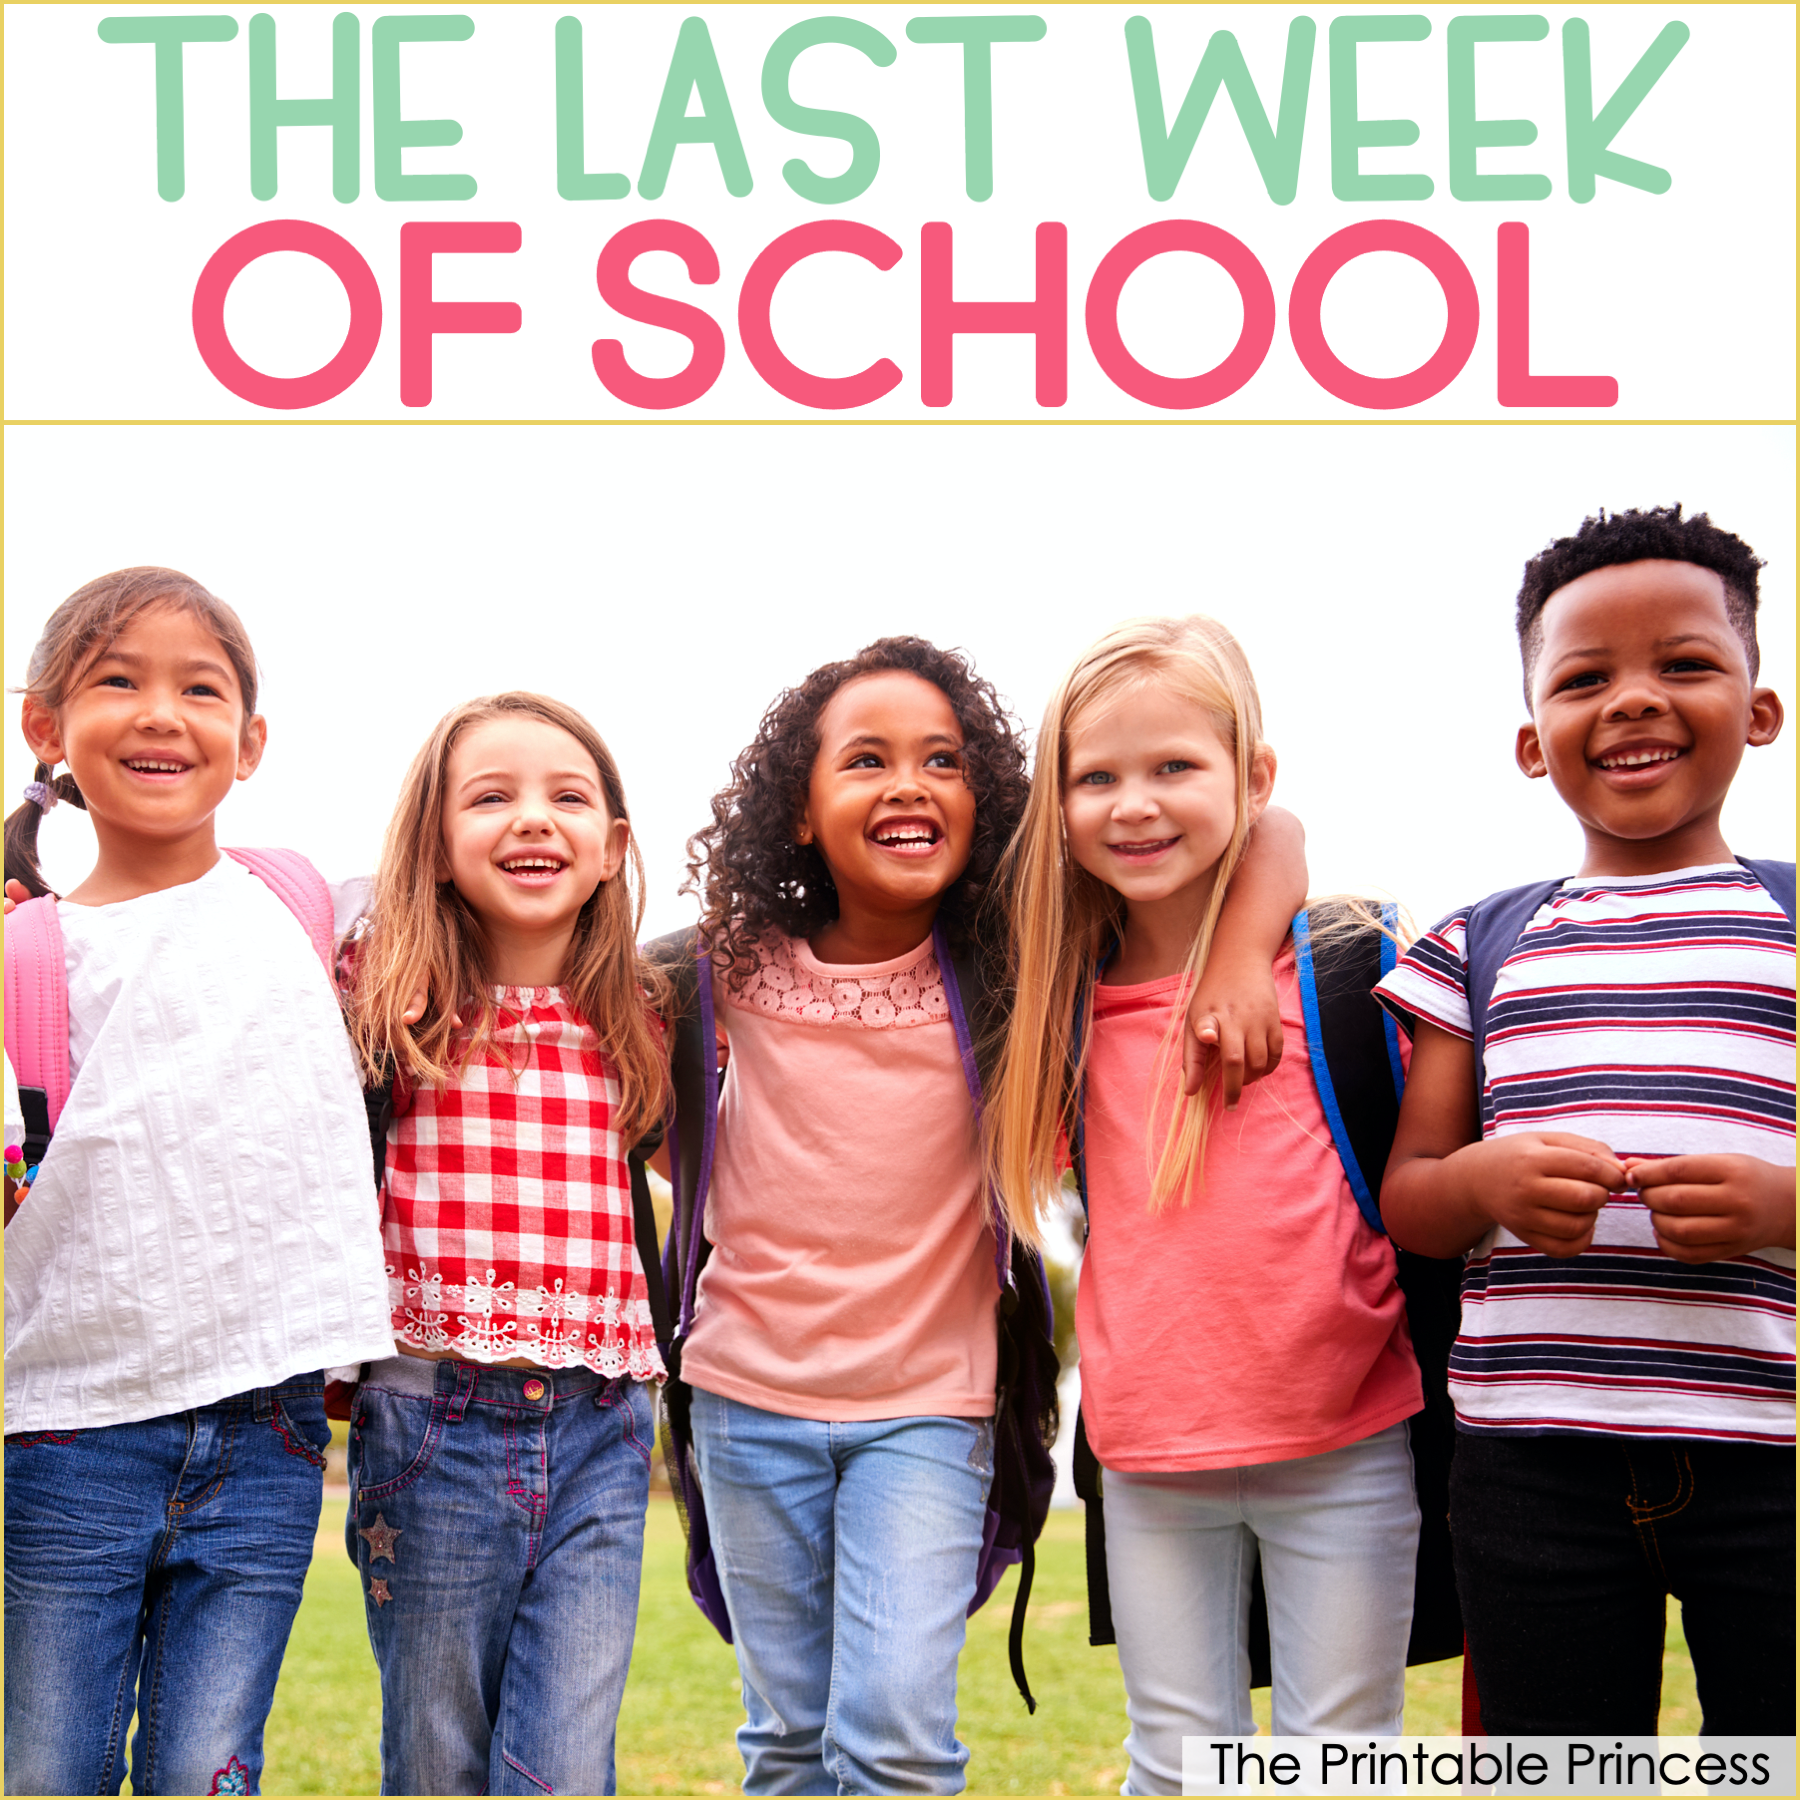 10 Fun Ideas for Celebrating the Last Week of School